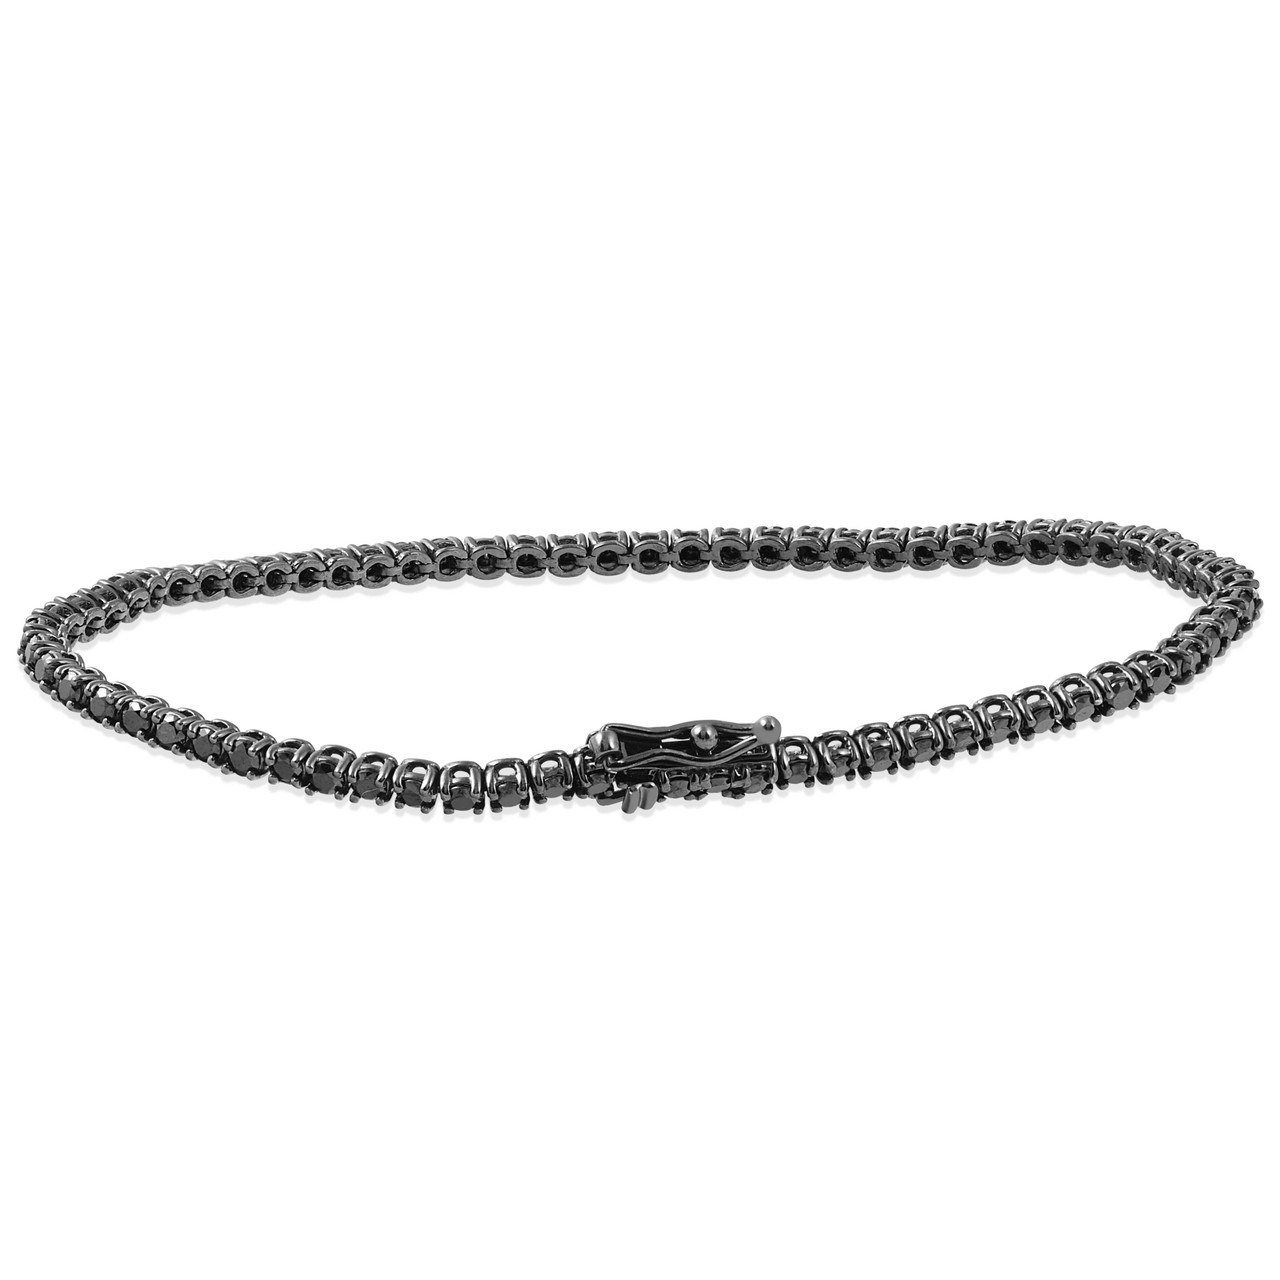 45a49b44d634d 3ct Black Diamond Tennis Bracelet 14K Black Gold 7